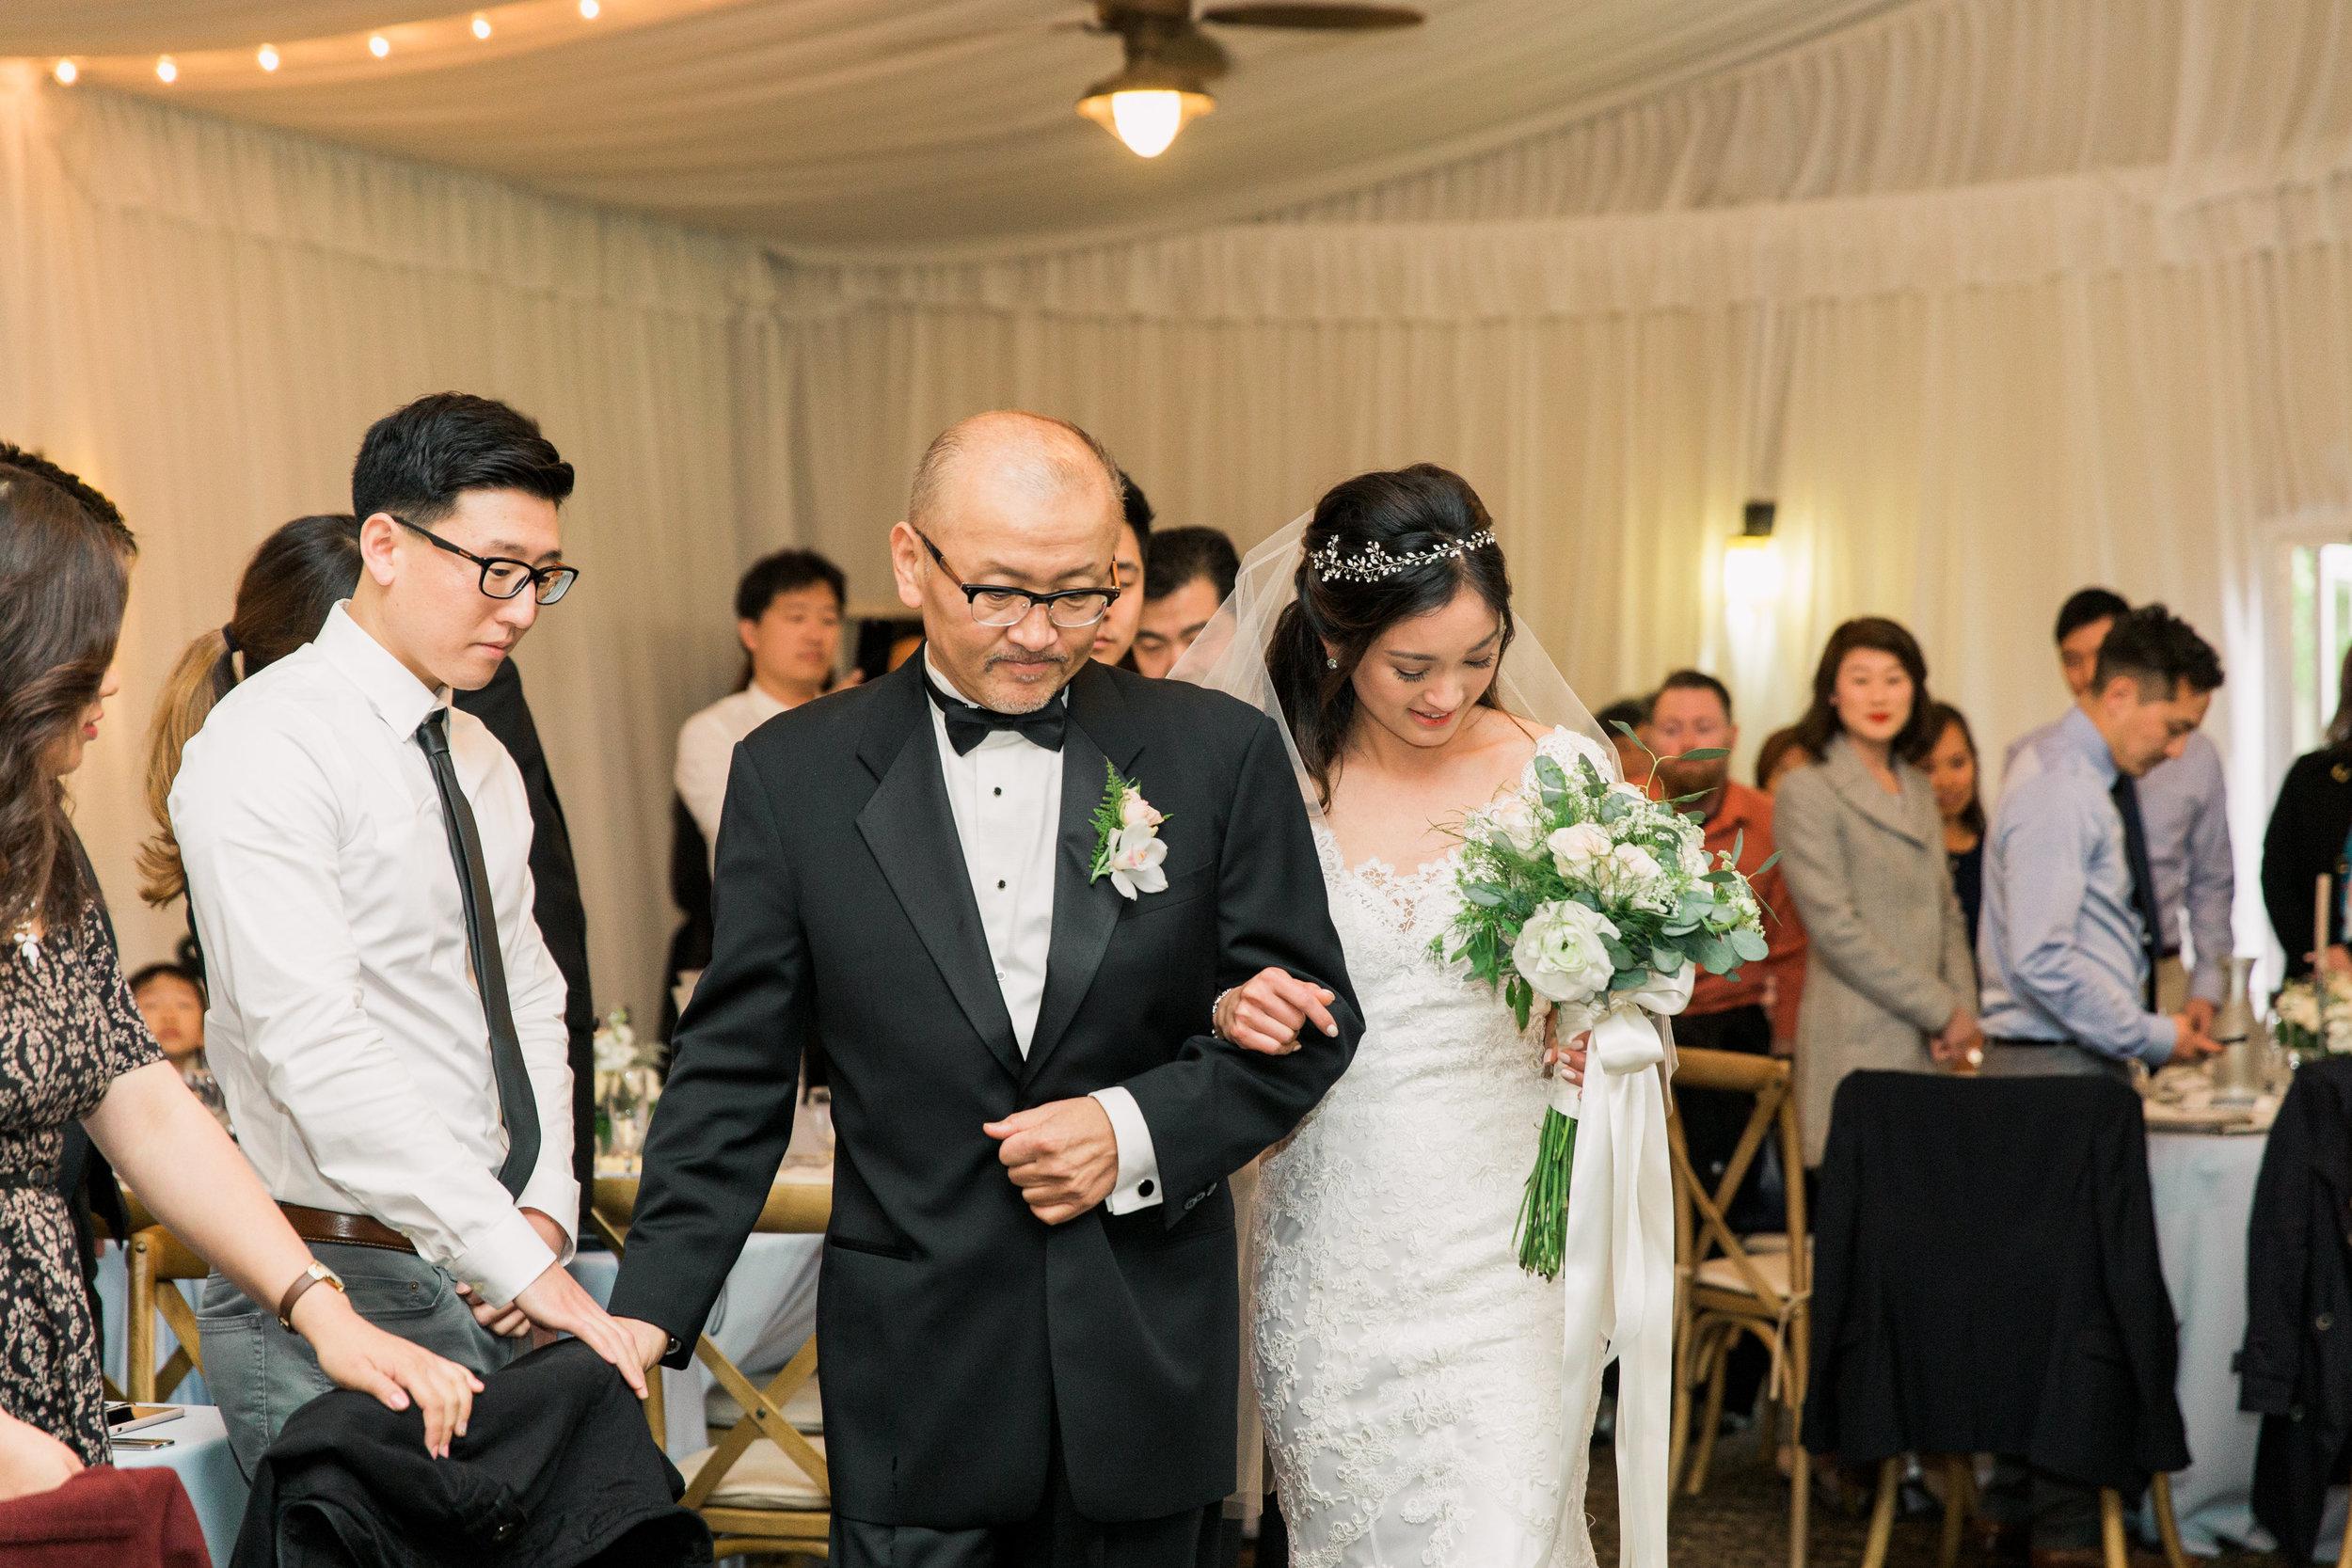 JA_Wedding_Ceremony_024.jpg